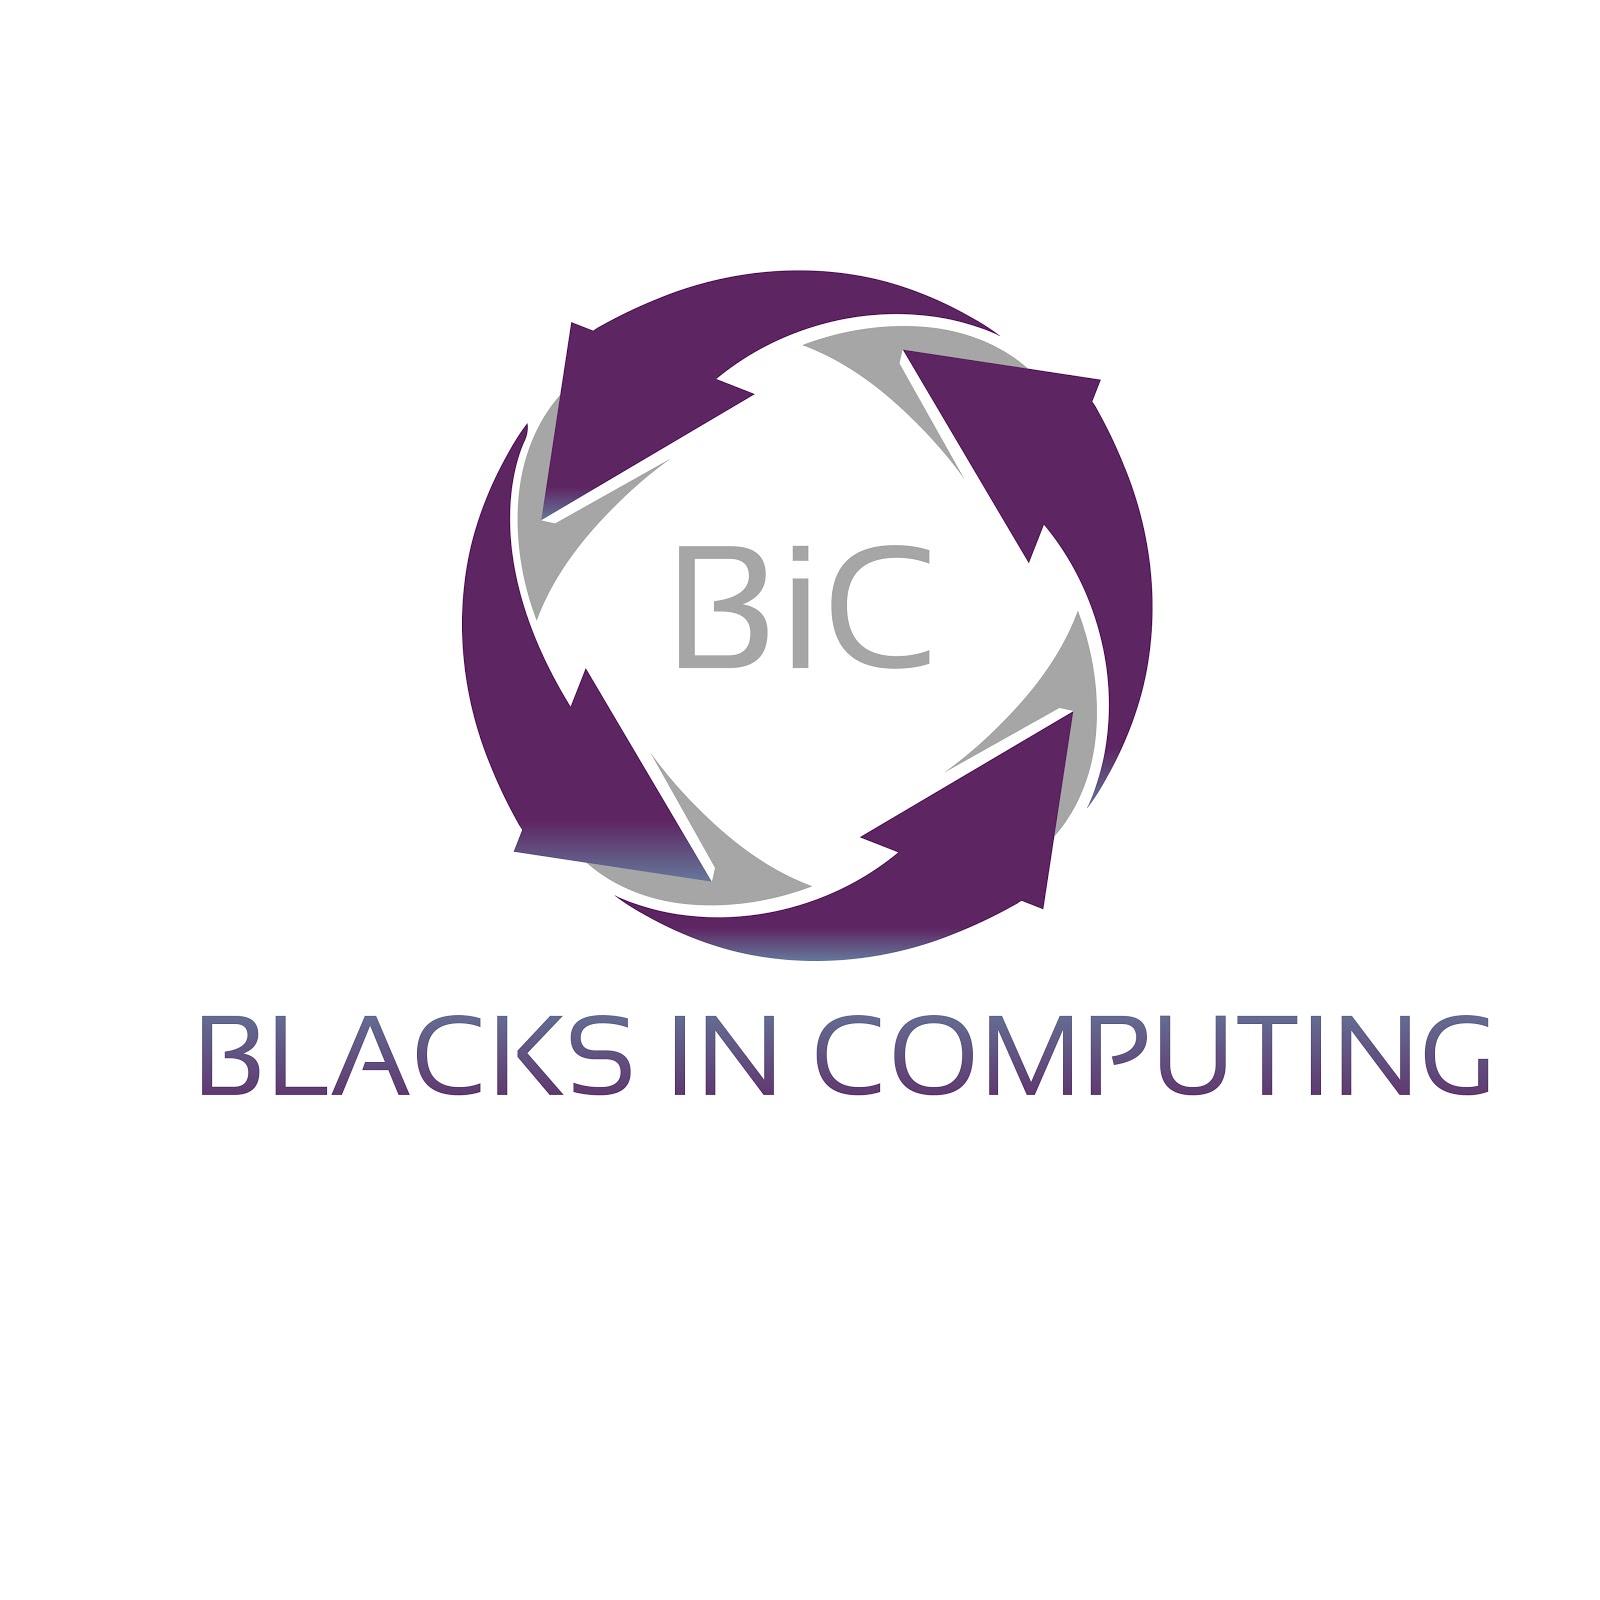 blacksincomputing